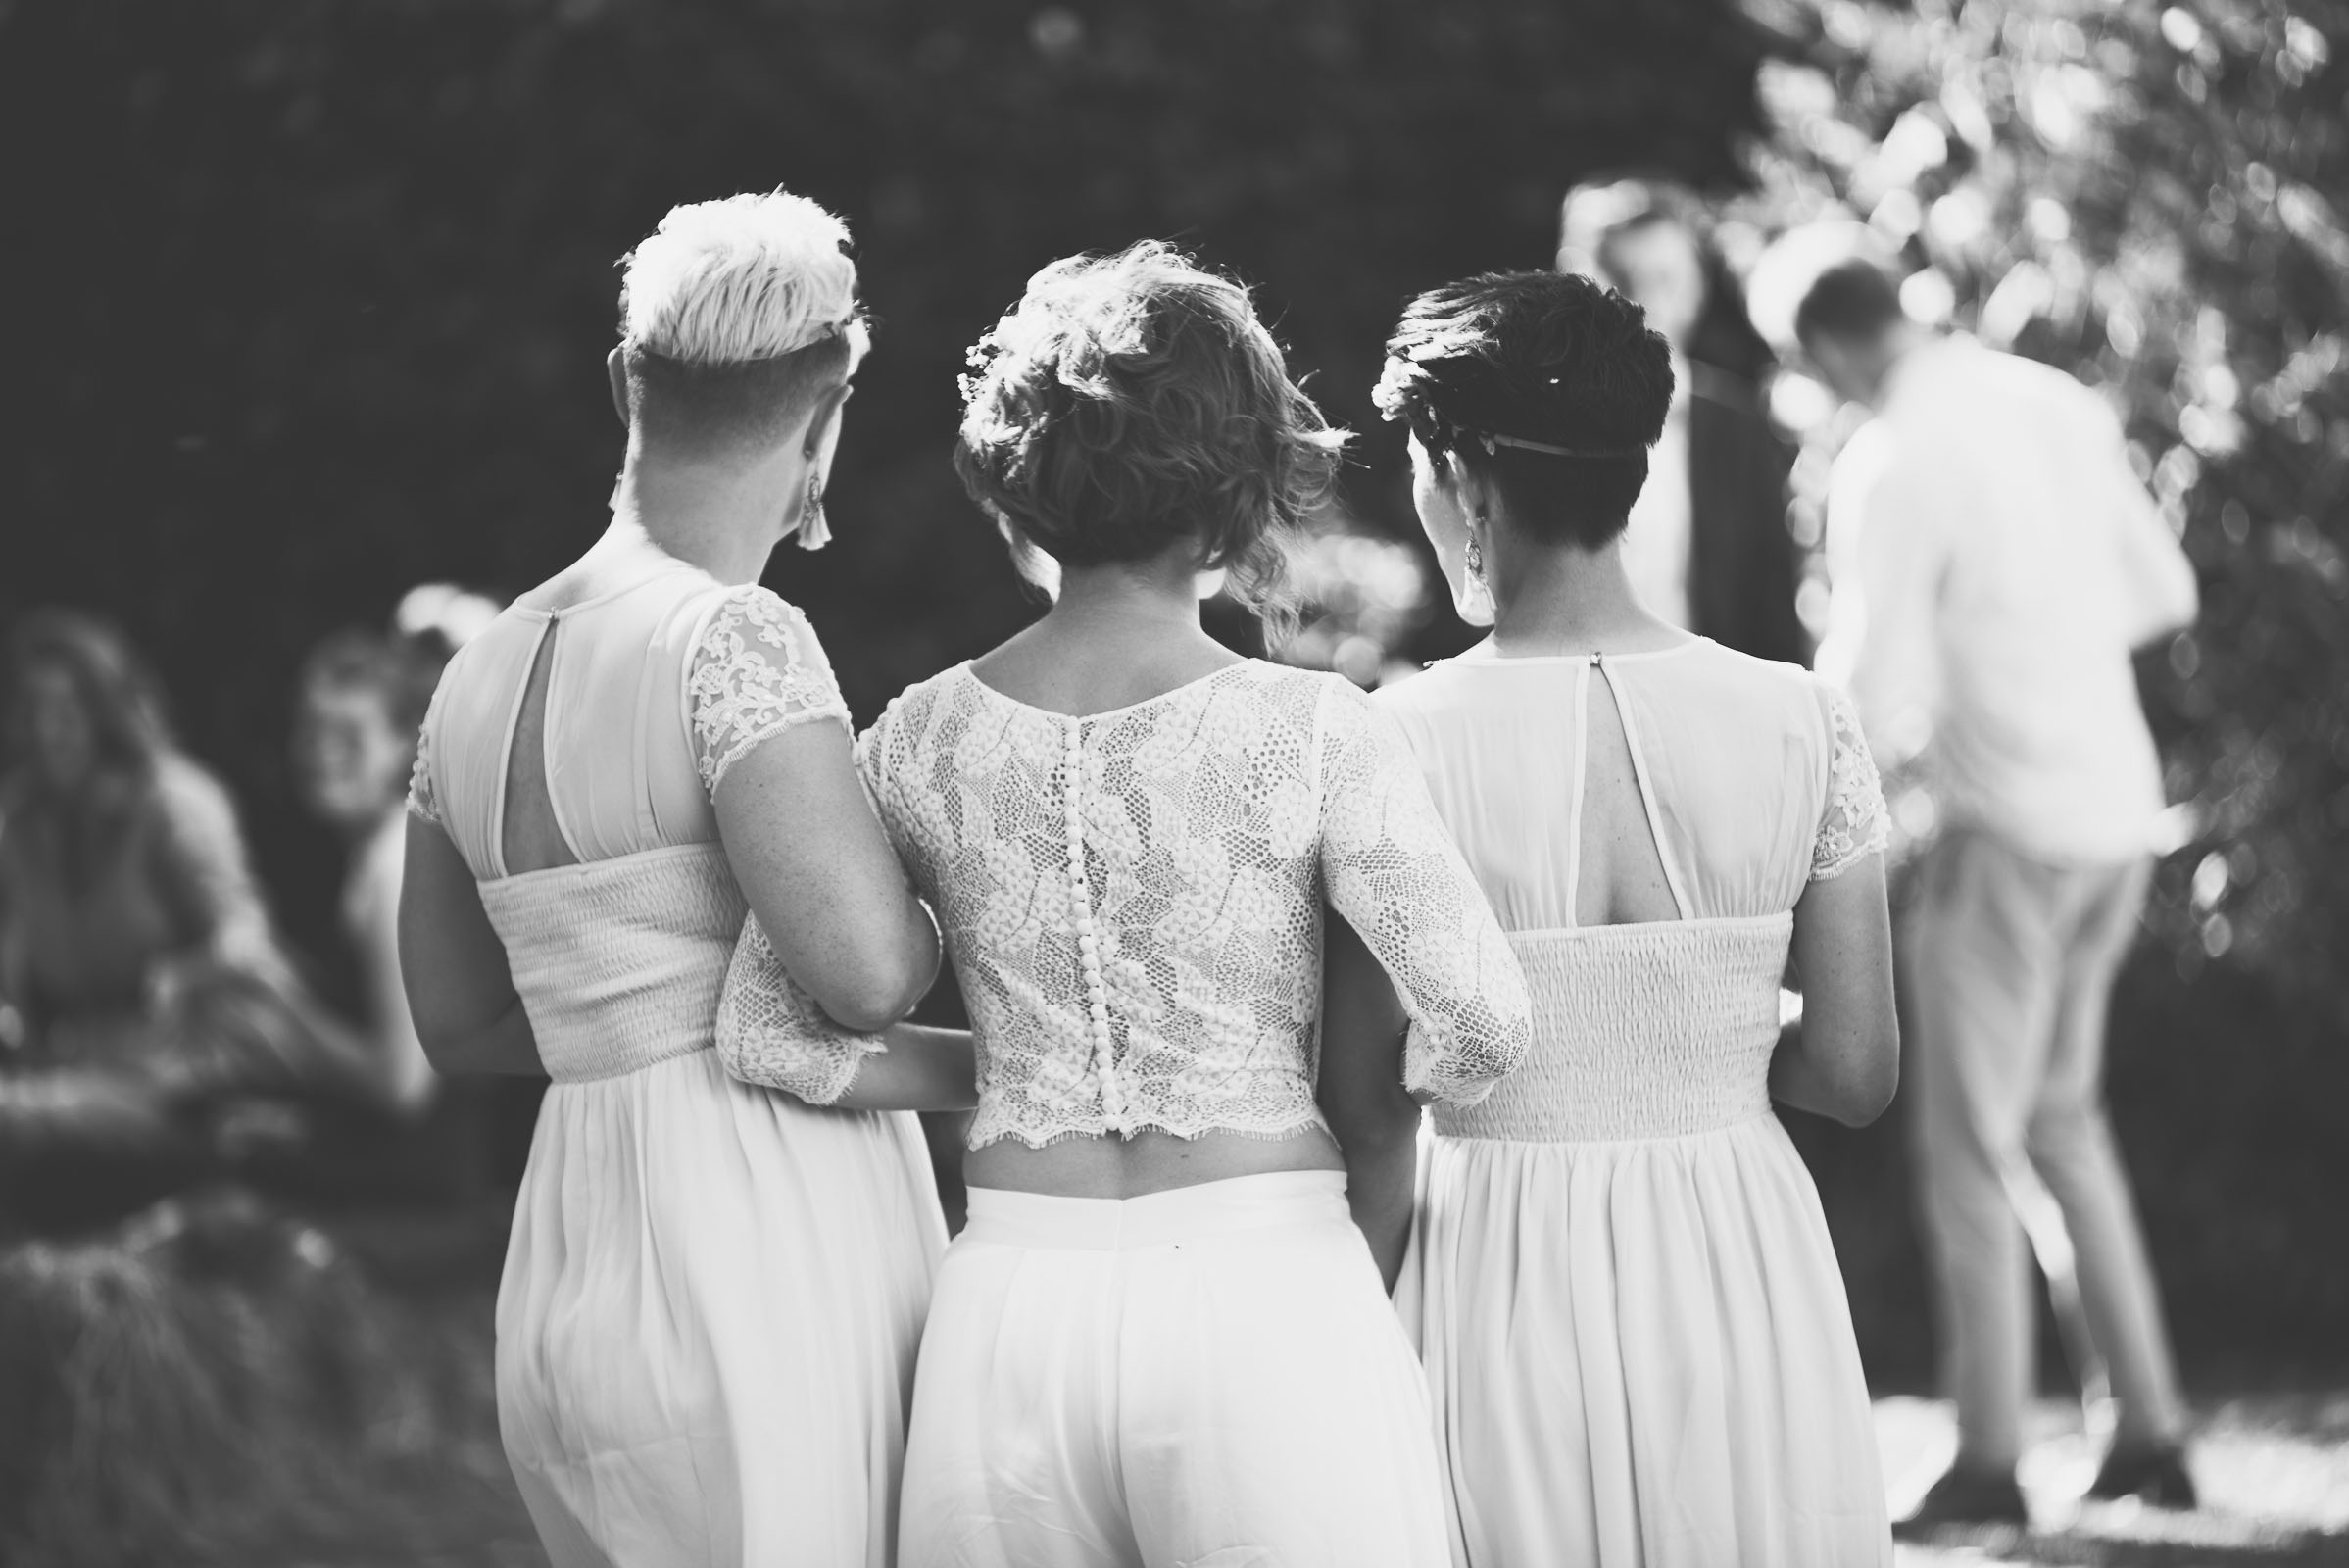 Hitchin_wedding_St_Pauls_Waldenbury_Royston_Wedding_Photographer-59.jpg